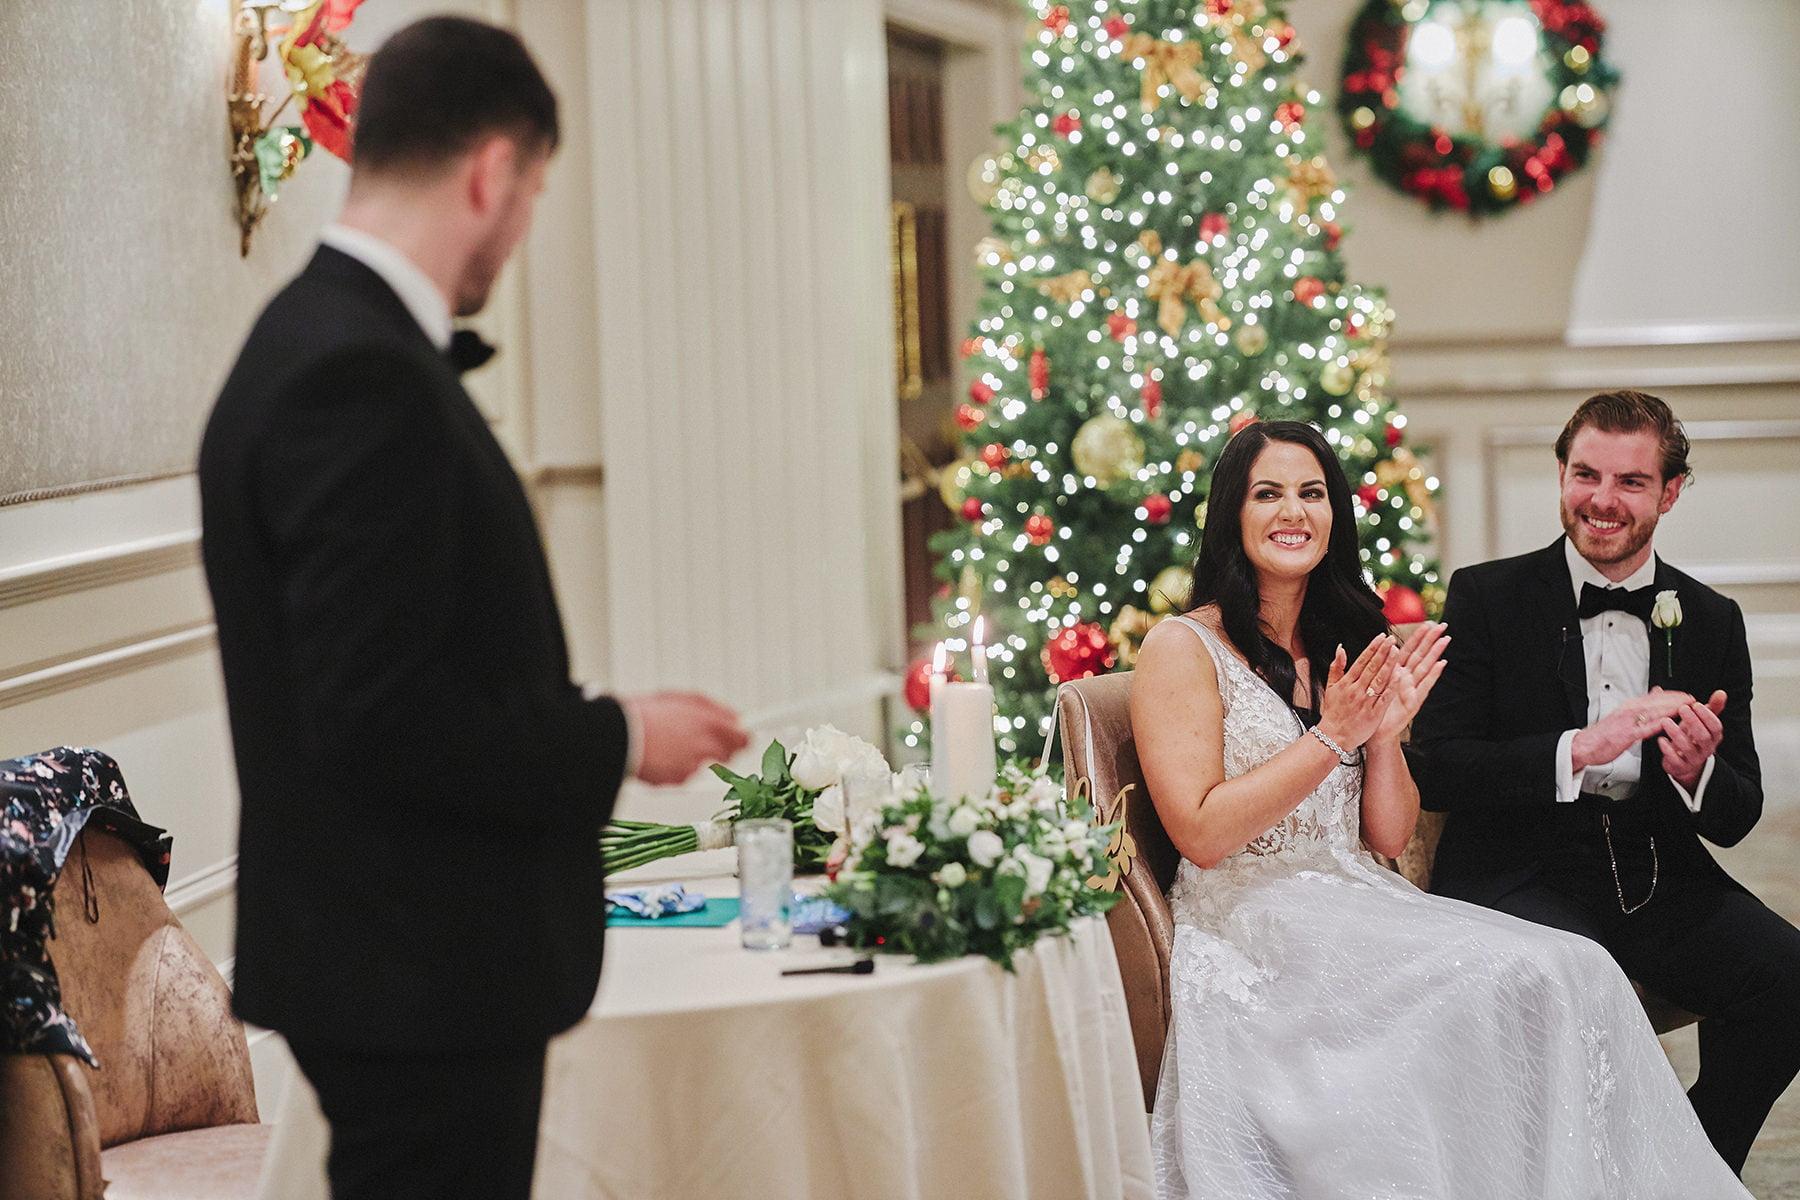 POWERSCOURT HOTEL RESORT INTIMATE WEDDING 51